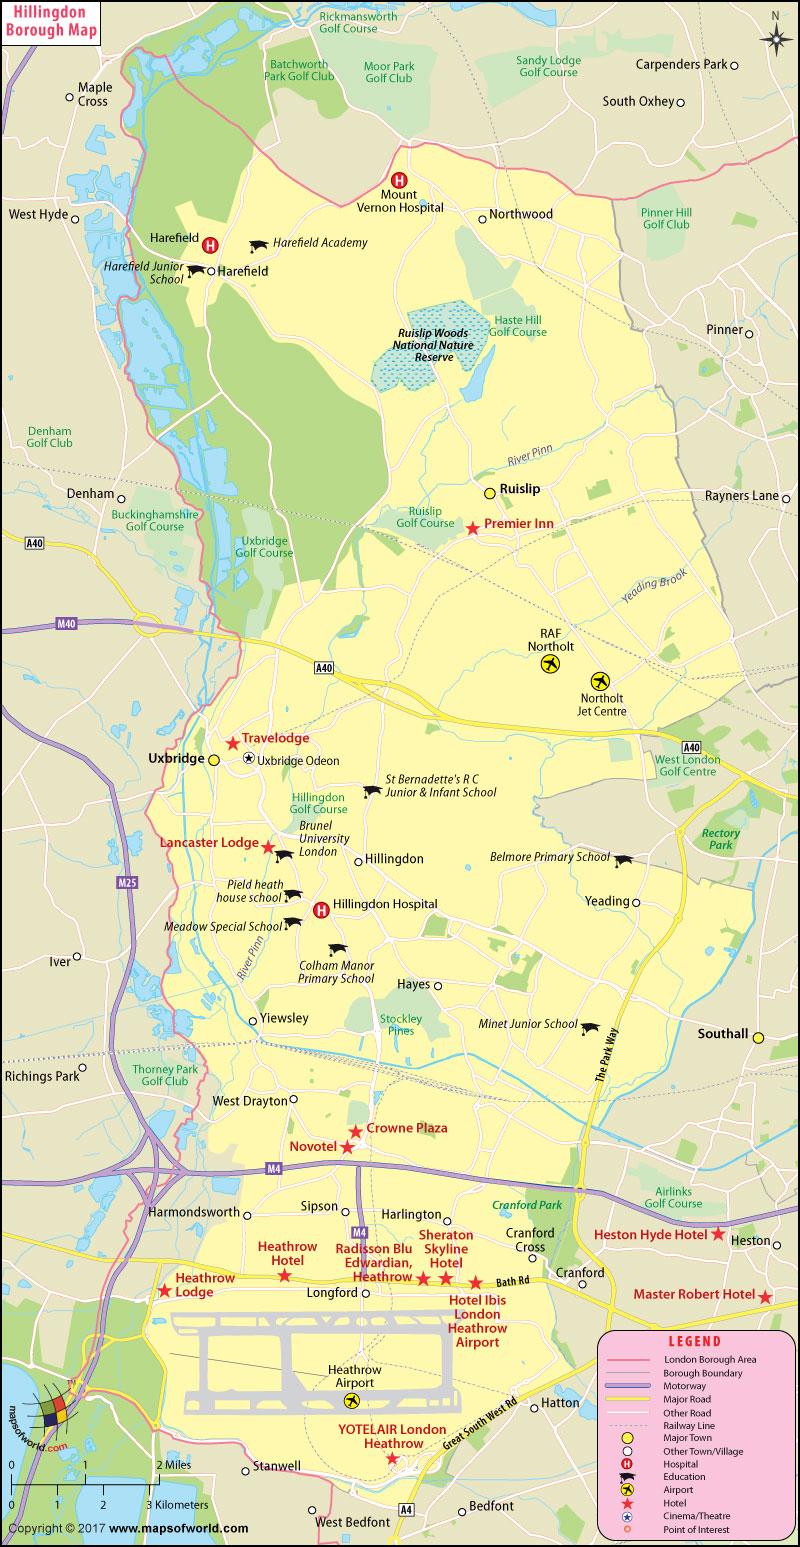 Hillingdon Borough Map, London